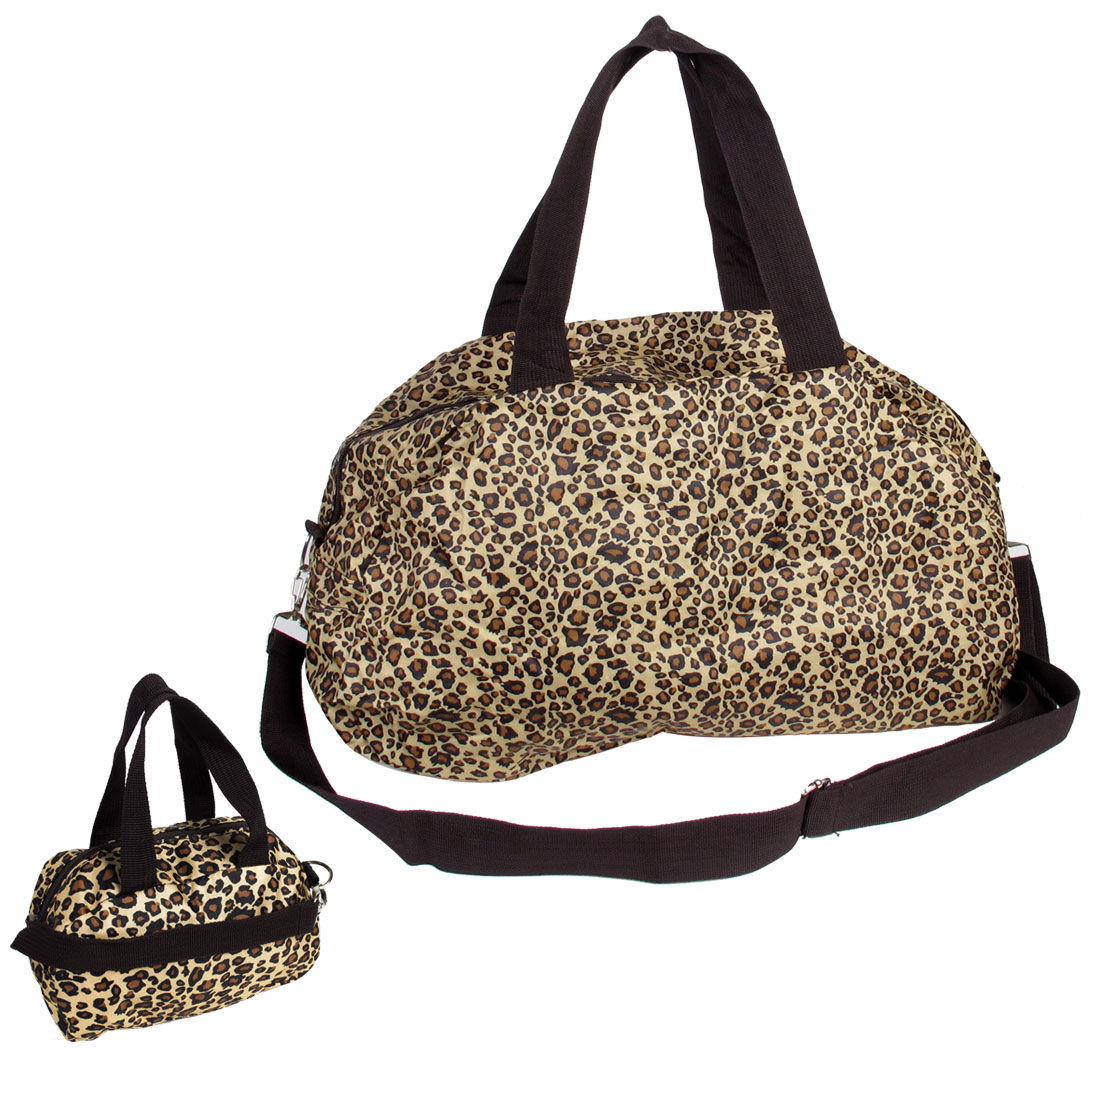 Foldable Black Beige Leopard Pattern Zippered Shopping Bag Handbag w Mini Purse